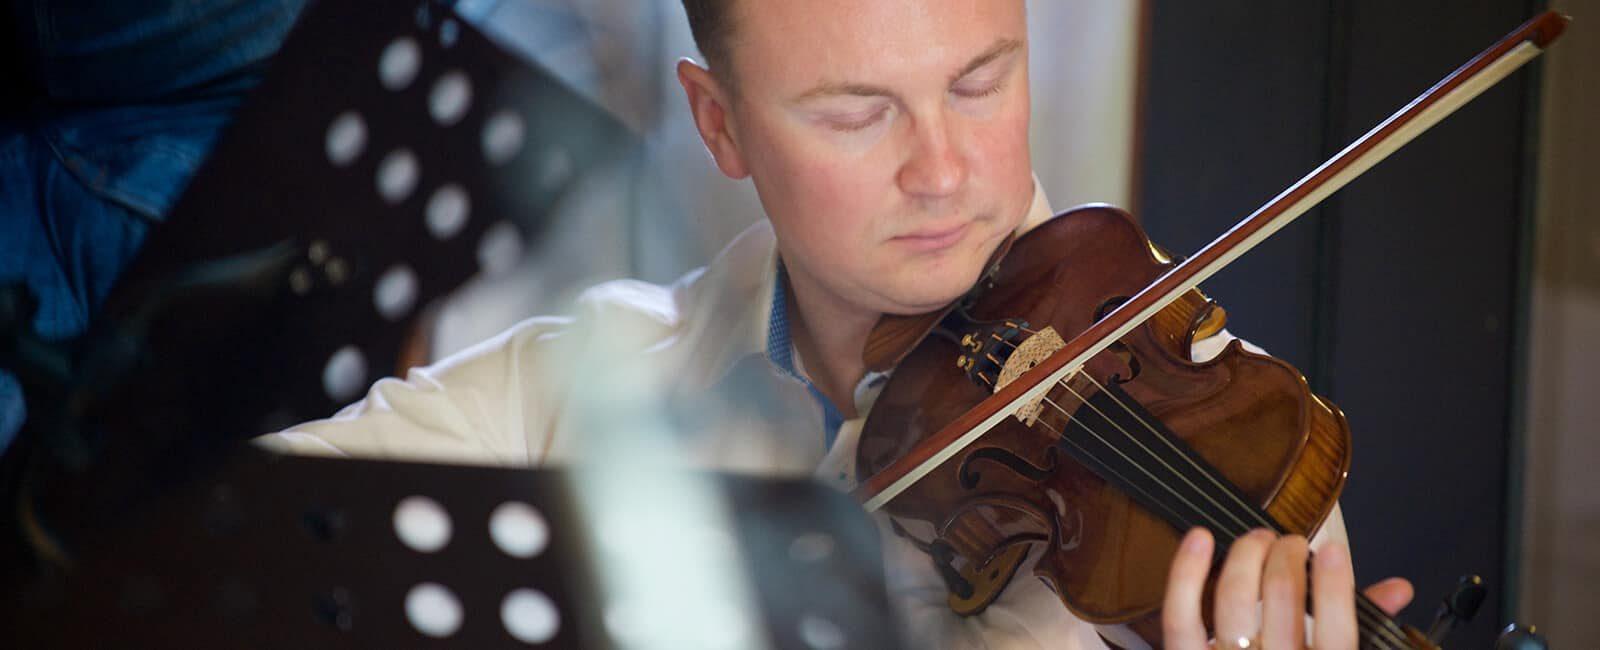 Violinist - Pominik Przywara